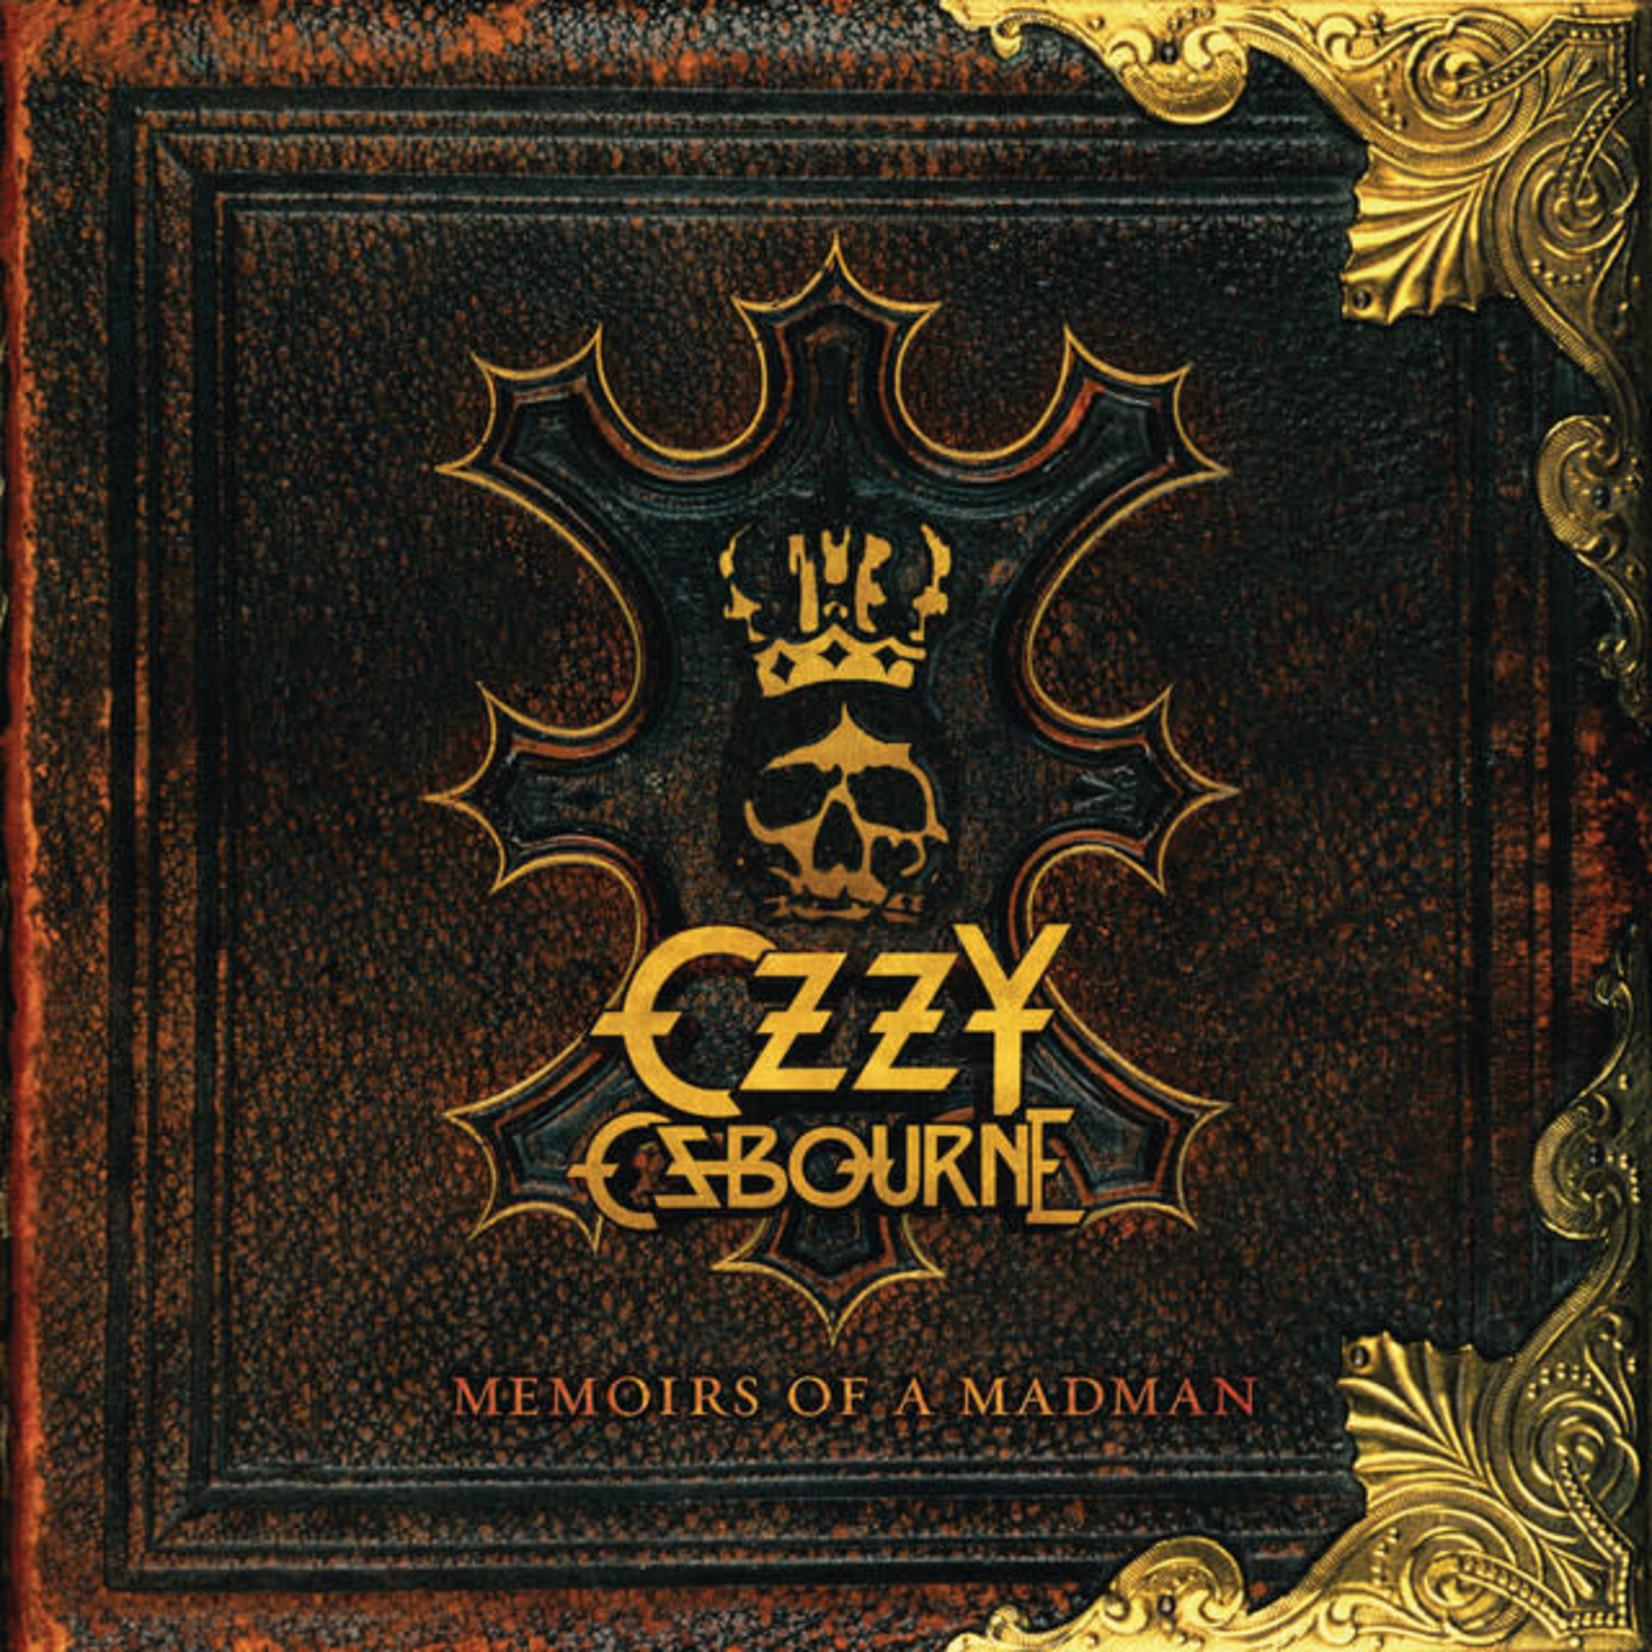 Vinyl Ozzy Osbourne - Memoirs Of A Madman